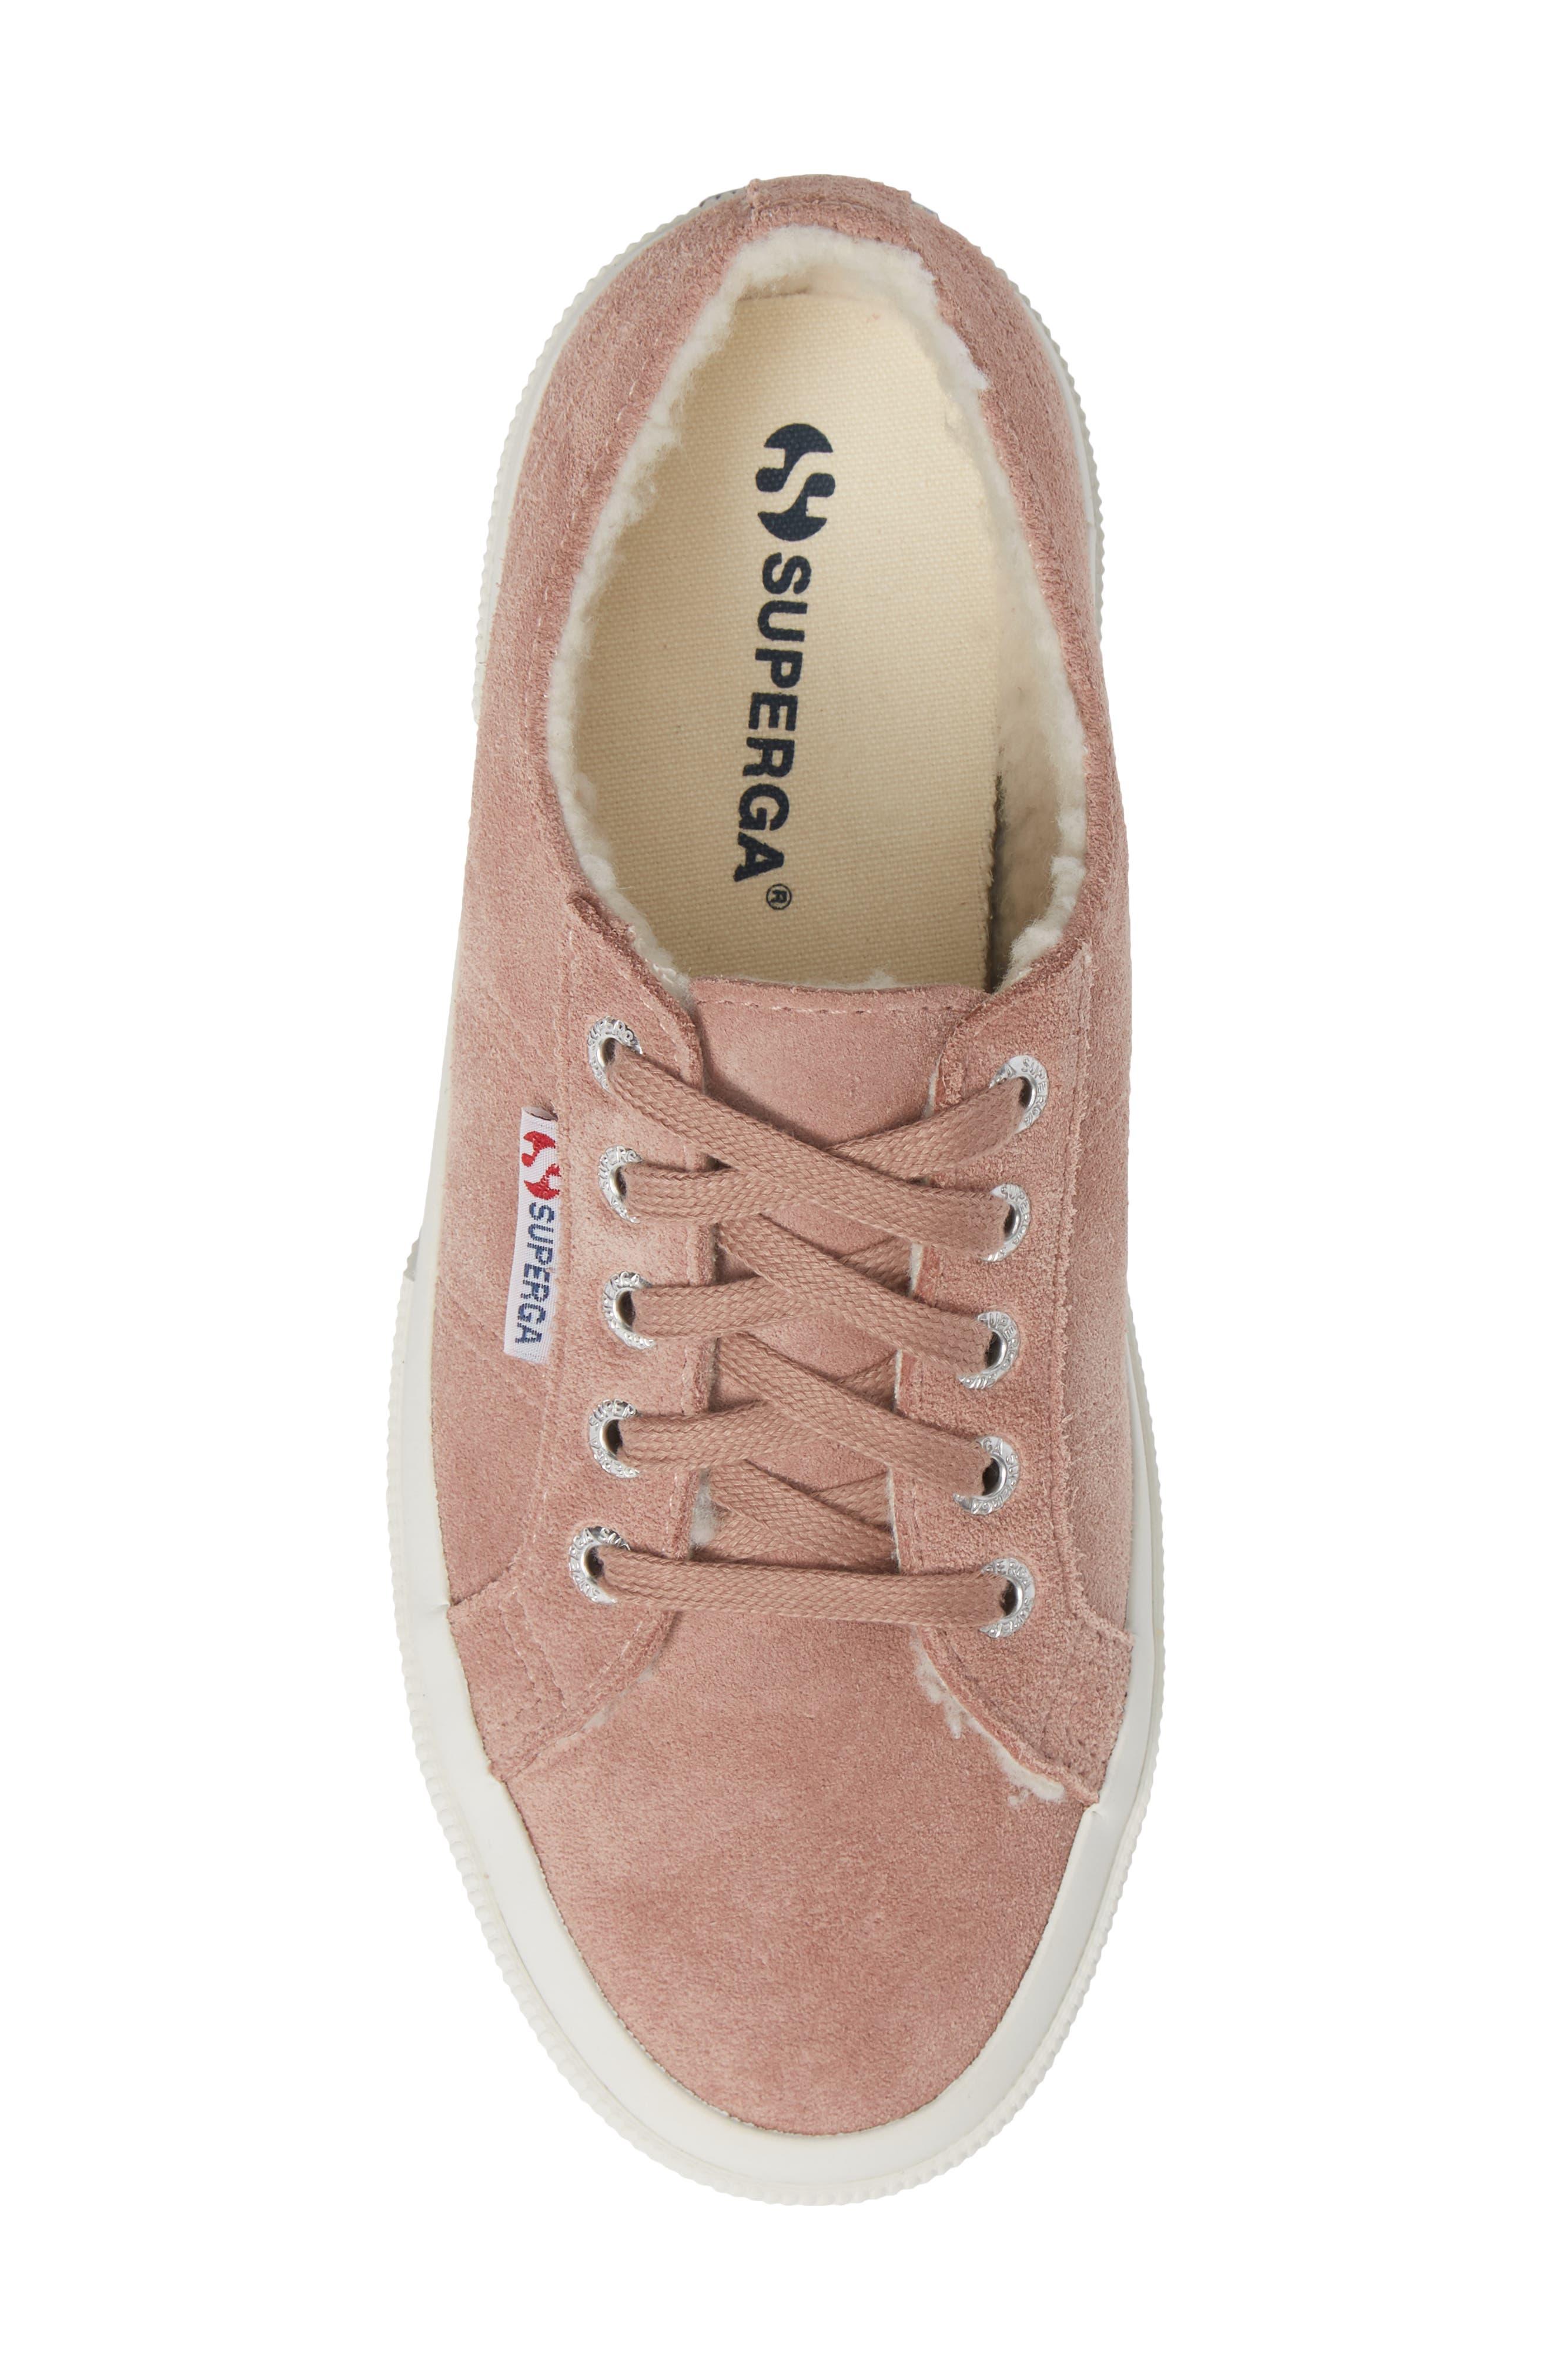 2750 Suefurw Sneaker,                             Alternate thumbnail 5, color,                             ROSE SUEDE